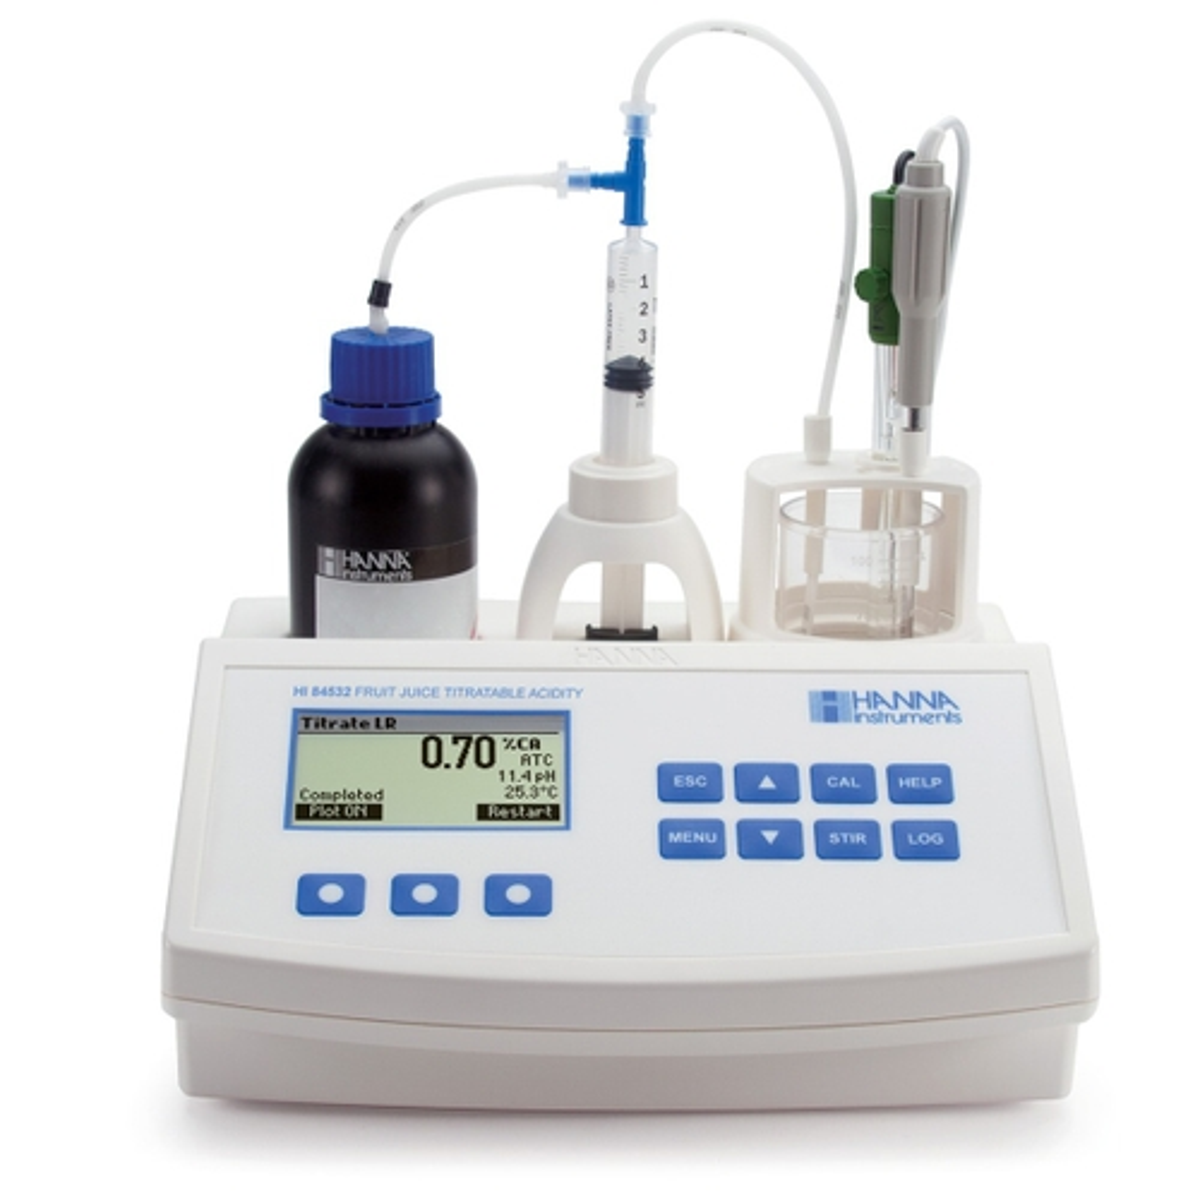 HI84532 Titratable Acidity Mini Titrator for Fruit Juice Analysis